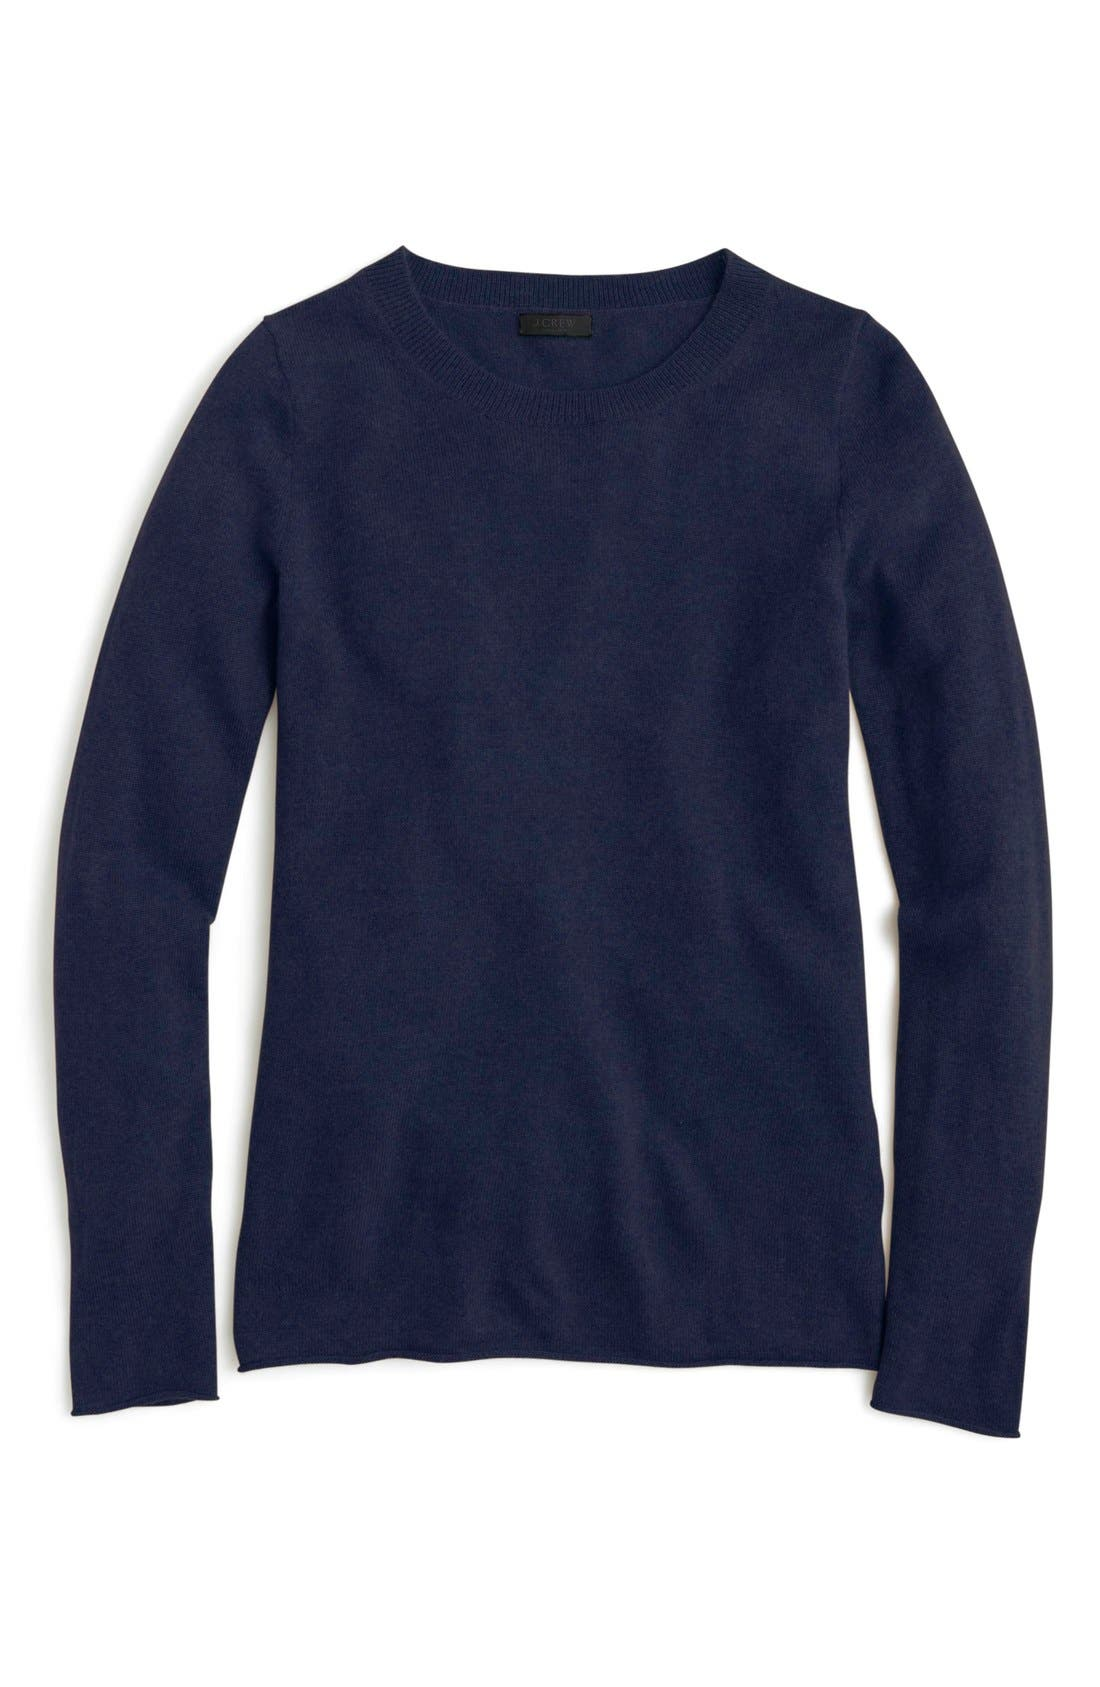 Main Image - J.Crew Long Sleeve Italian Cashmere Sweater